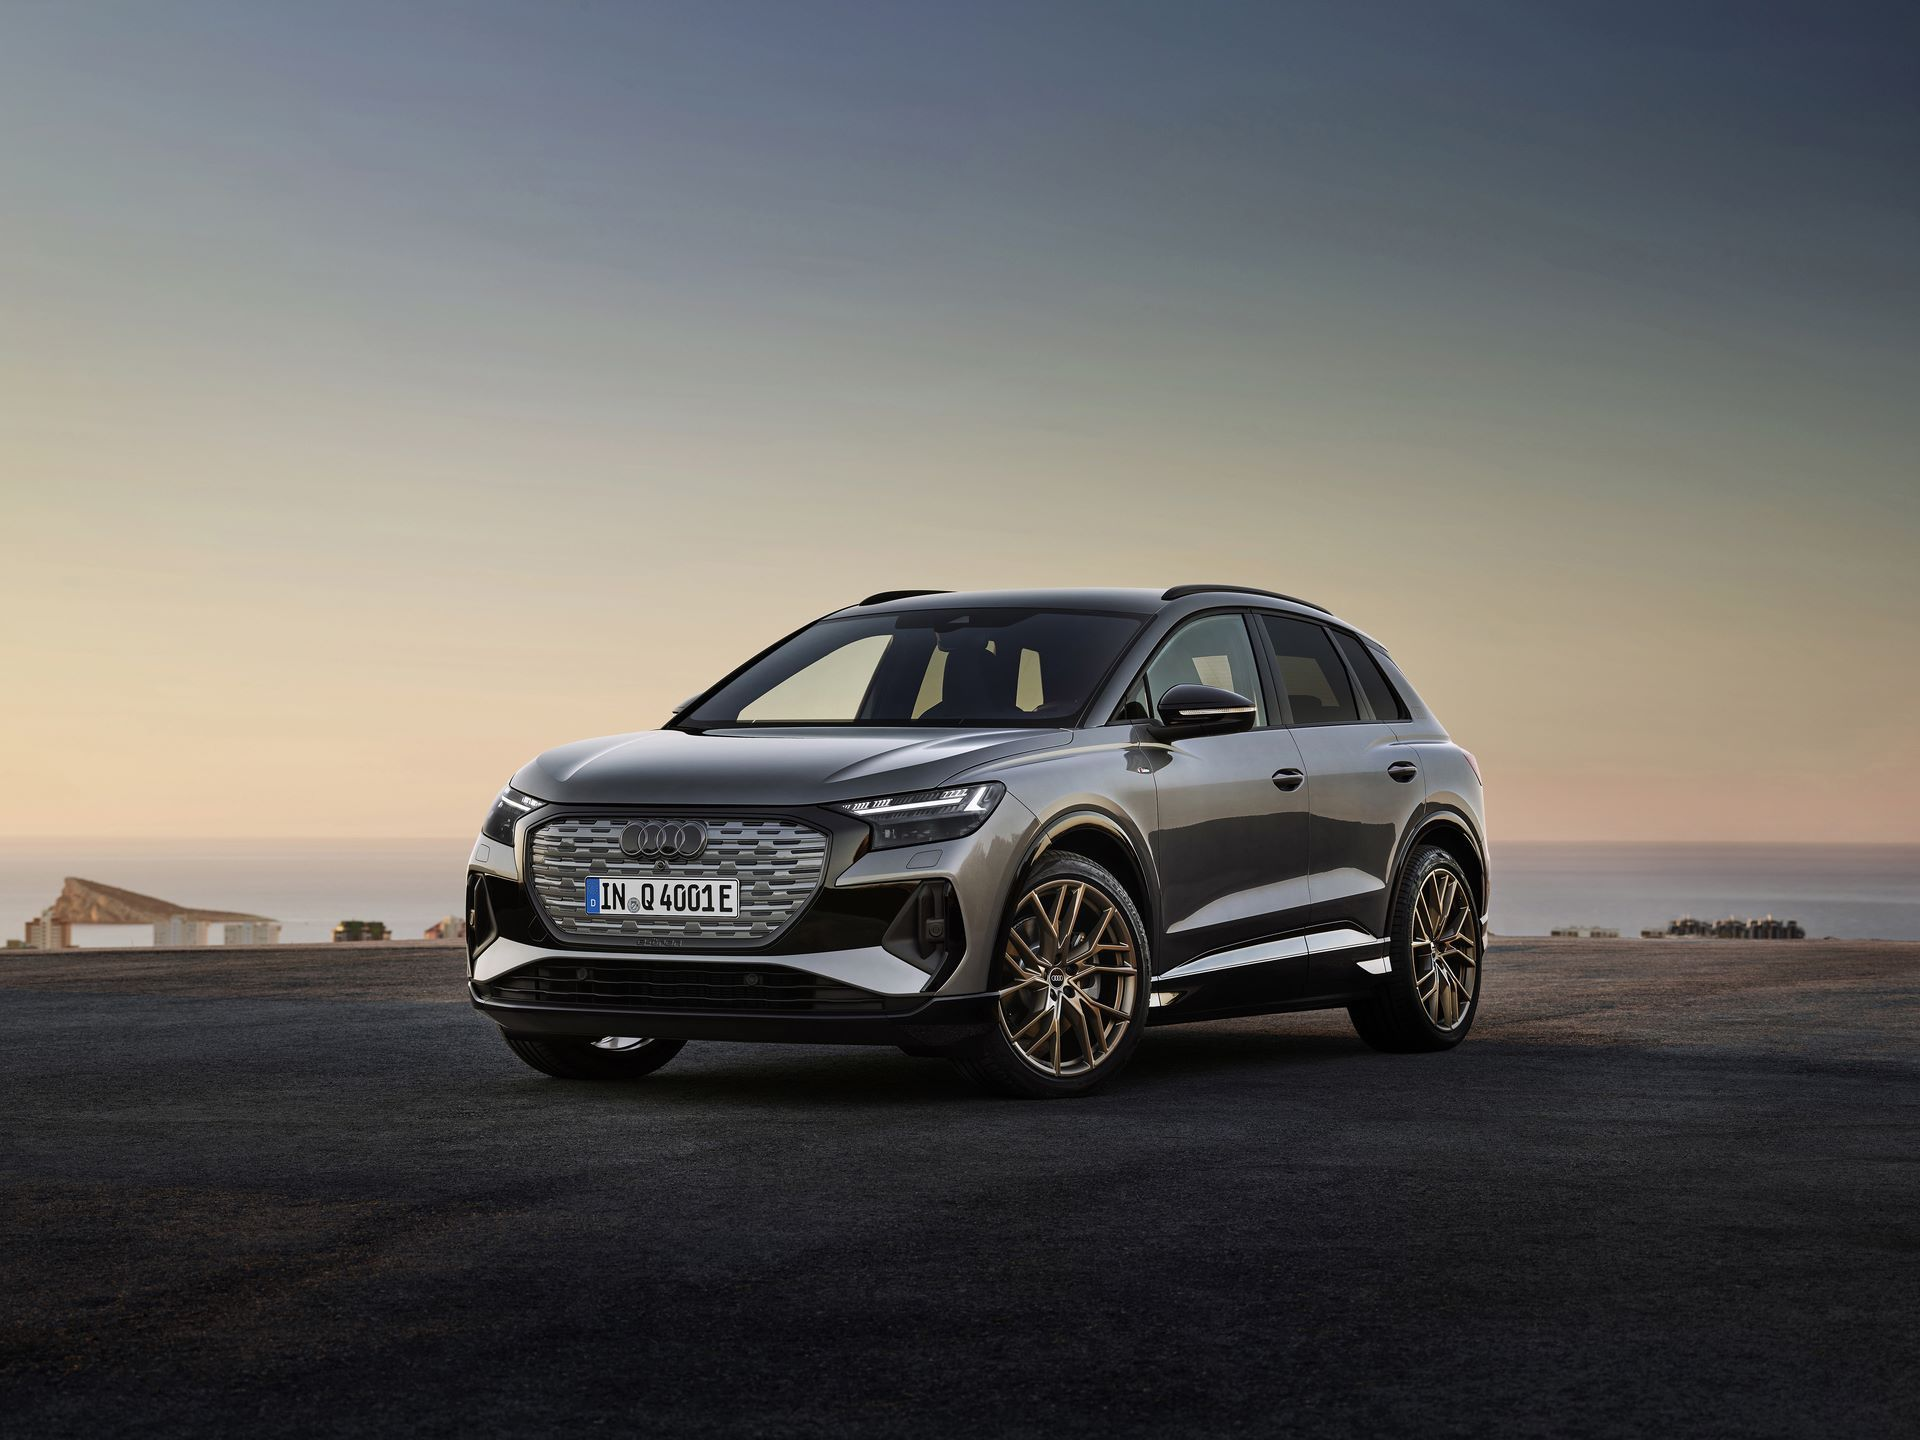 Audi-Q4-e-tron-and-Q4-e-tron-Sportback-43